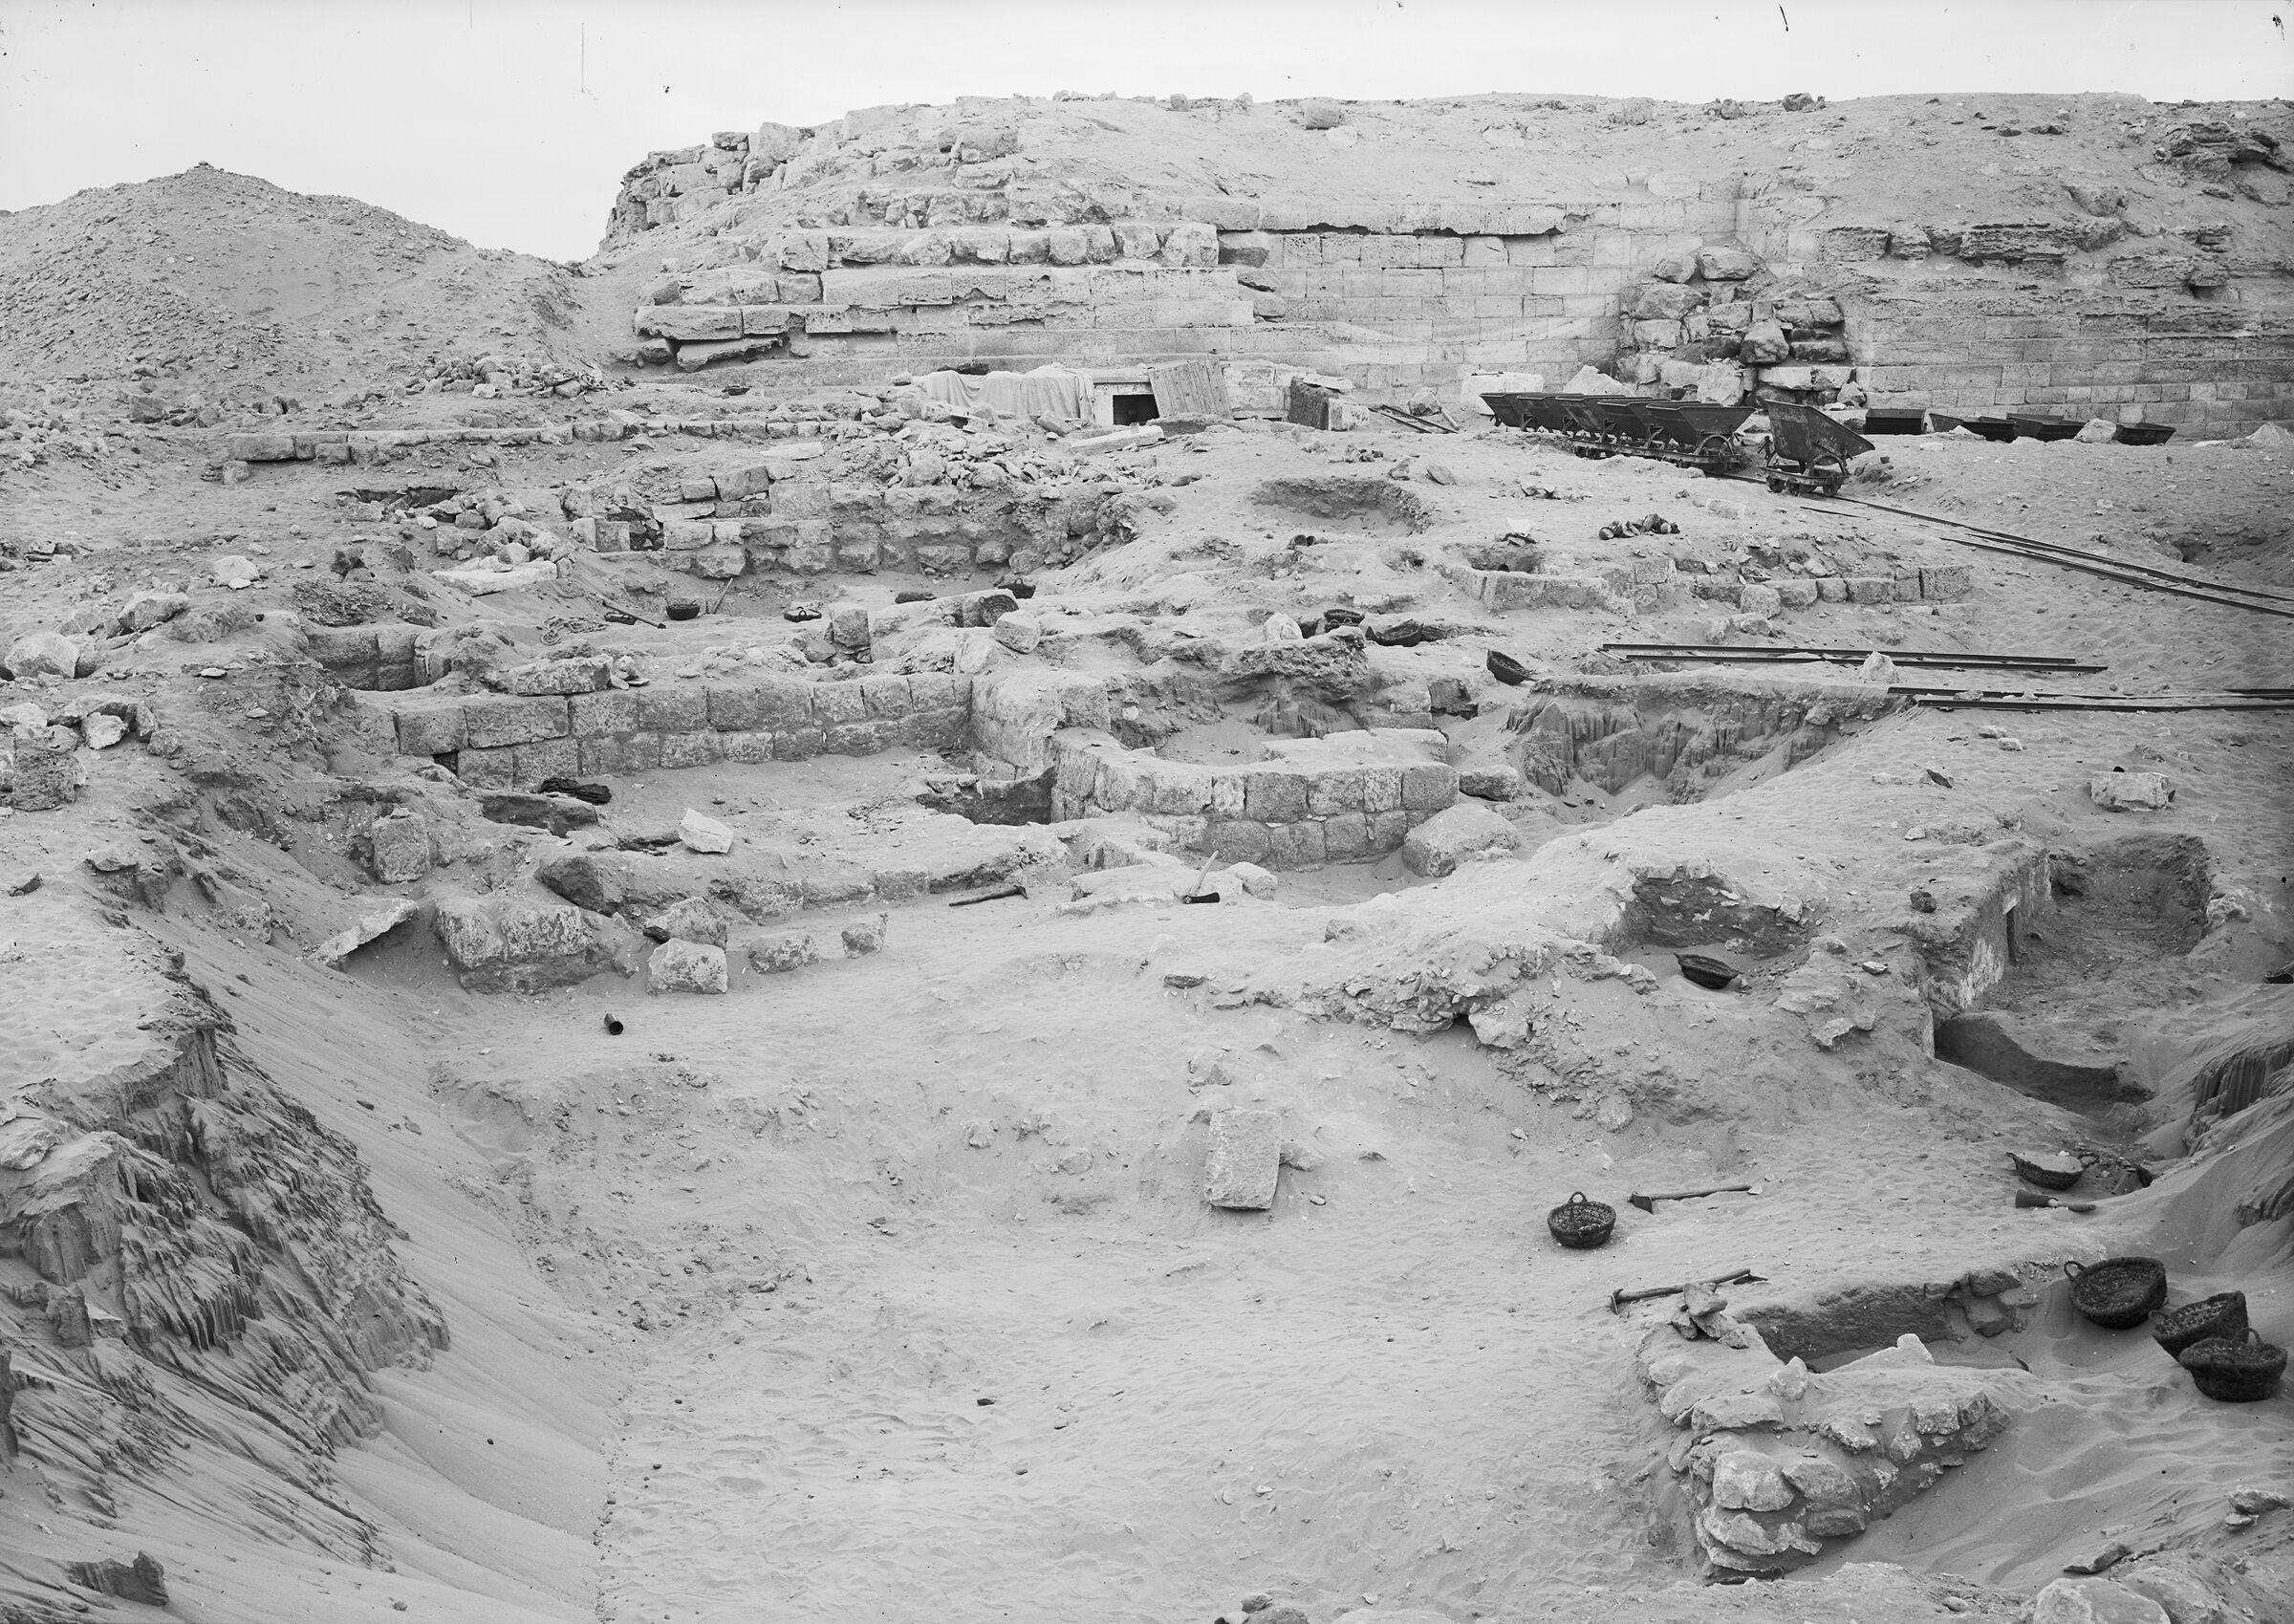 Western Cemetery: Site: Giza; View: G 2017, G 2016, G 2015, G 2013, G 2014, G 2010, G 2011